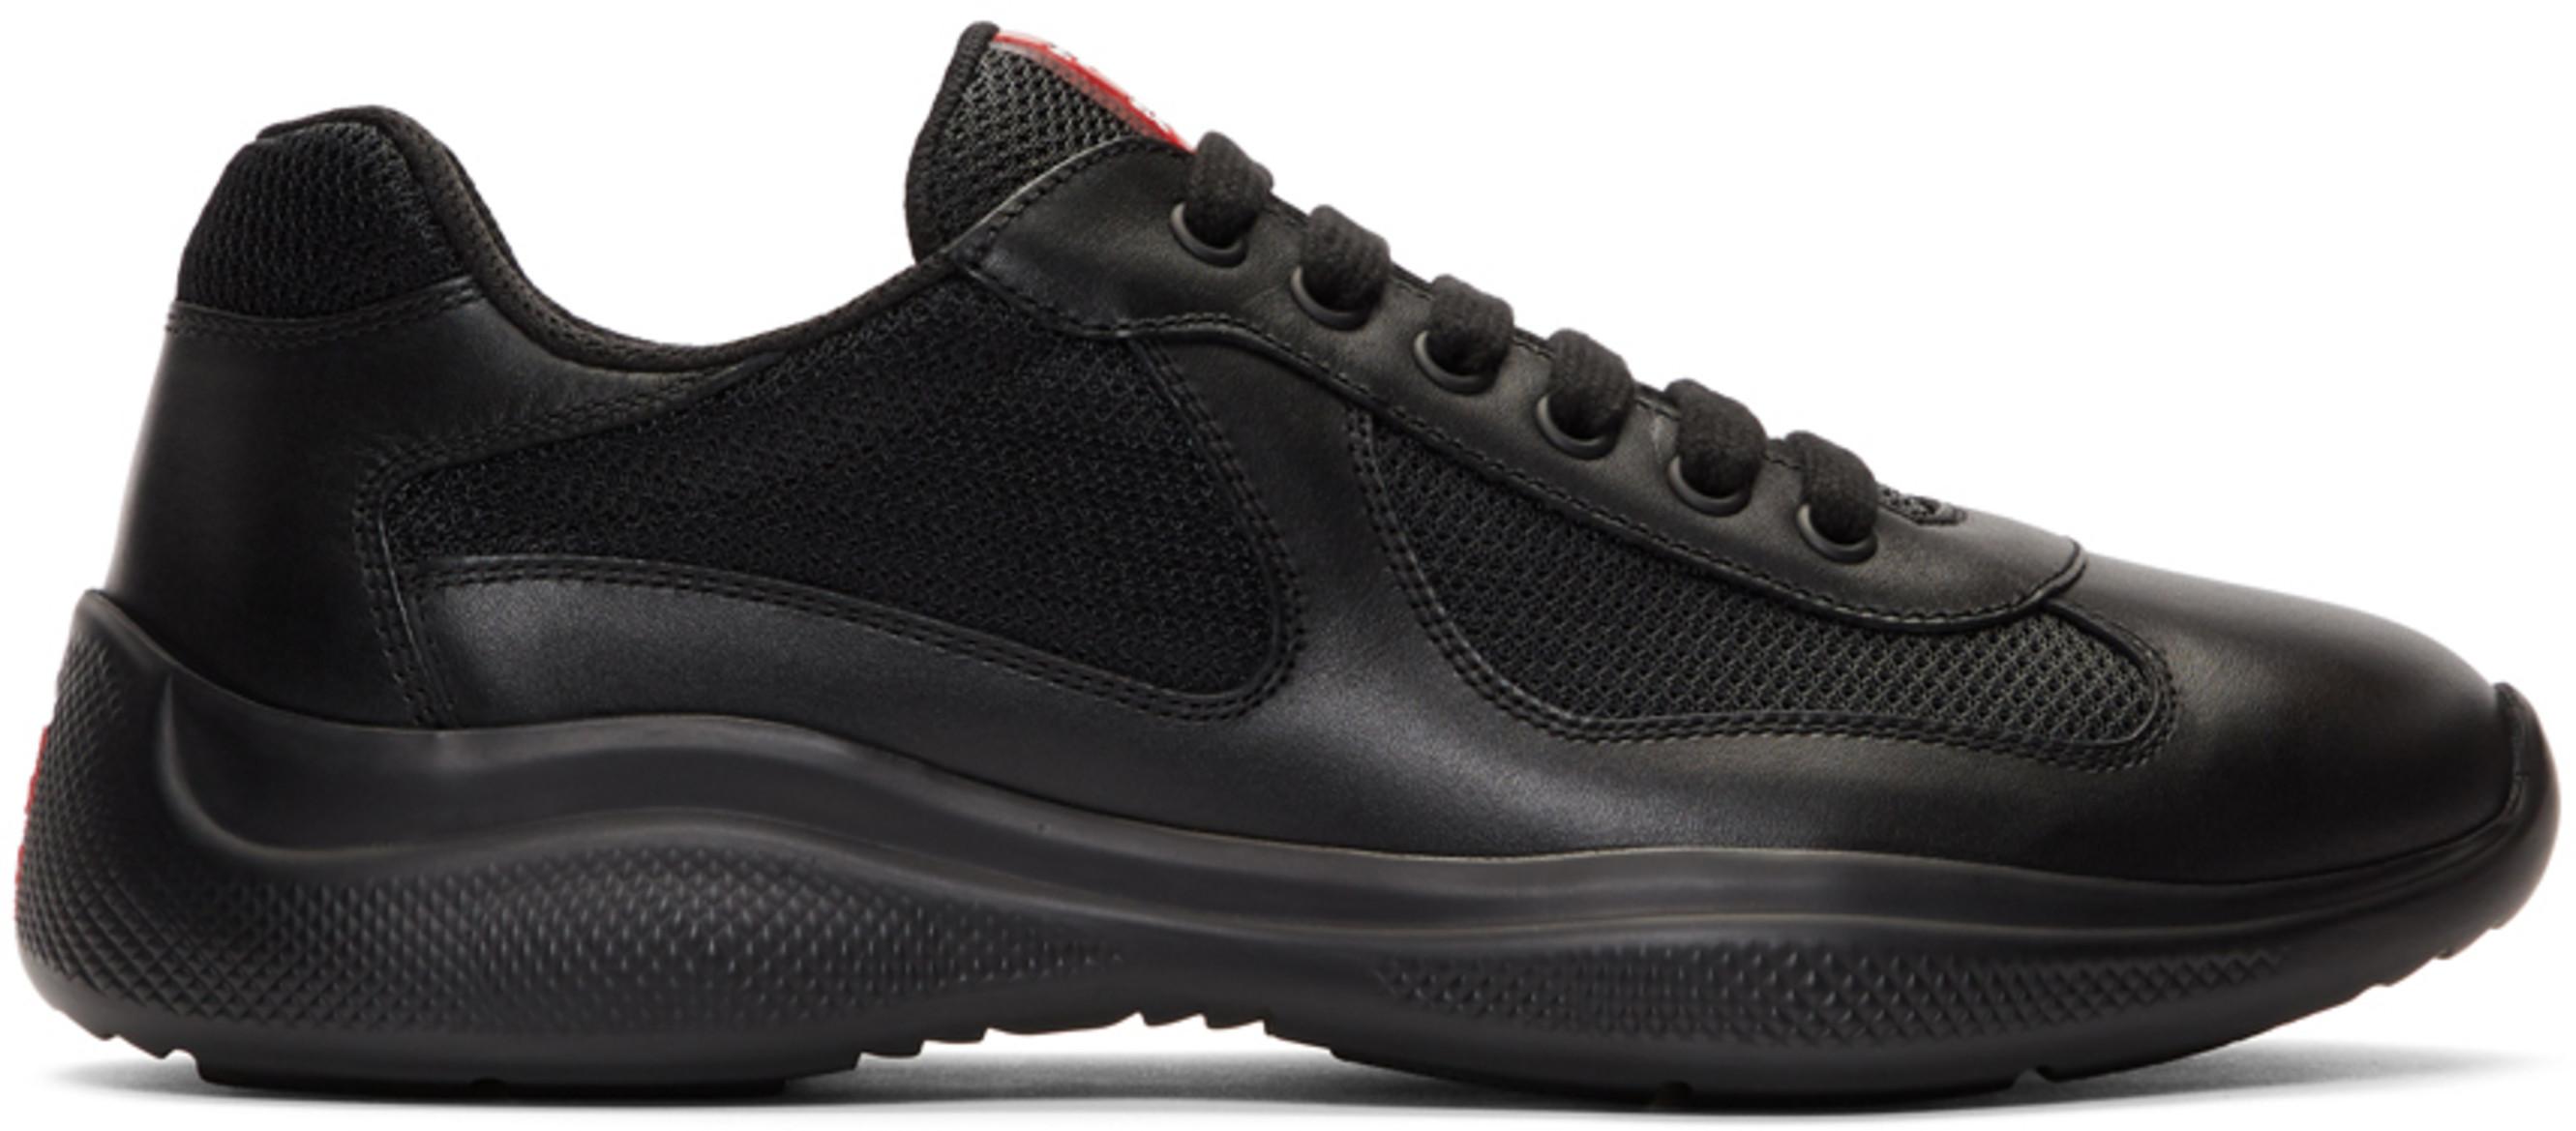 c7c76355eb1e Designer low top sneakers for Men